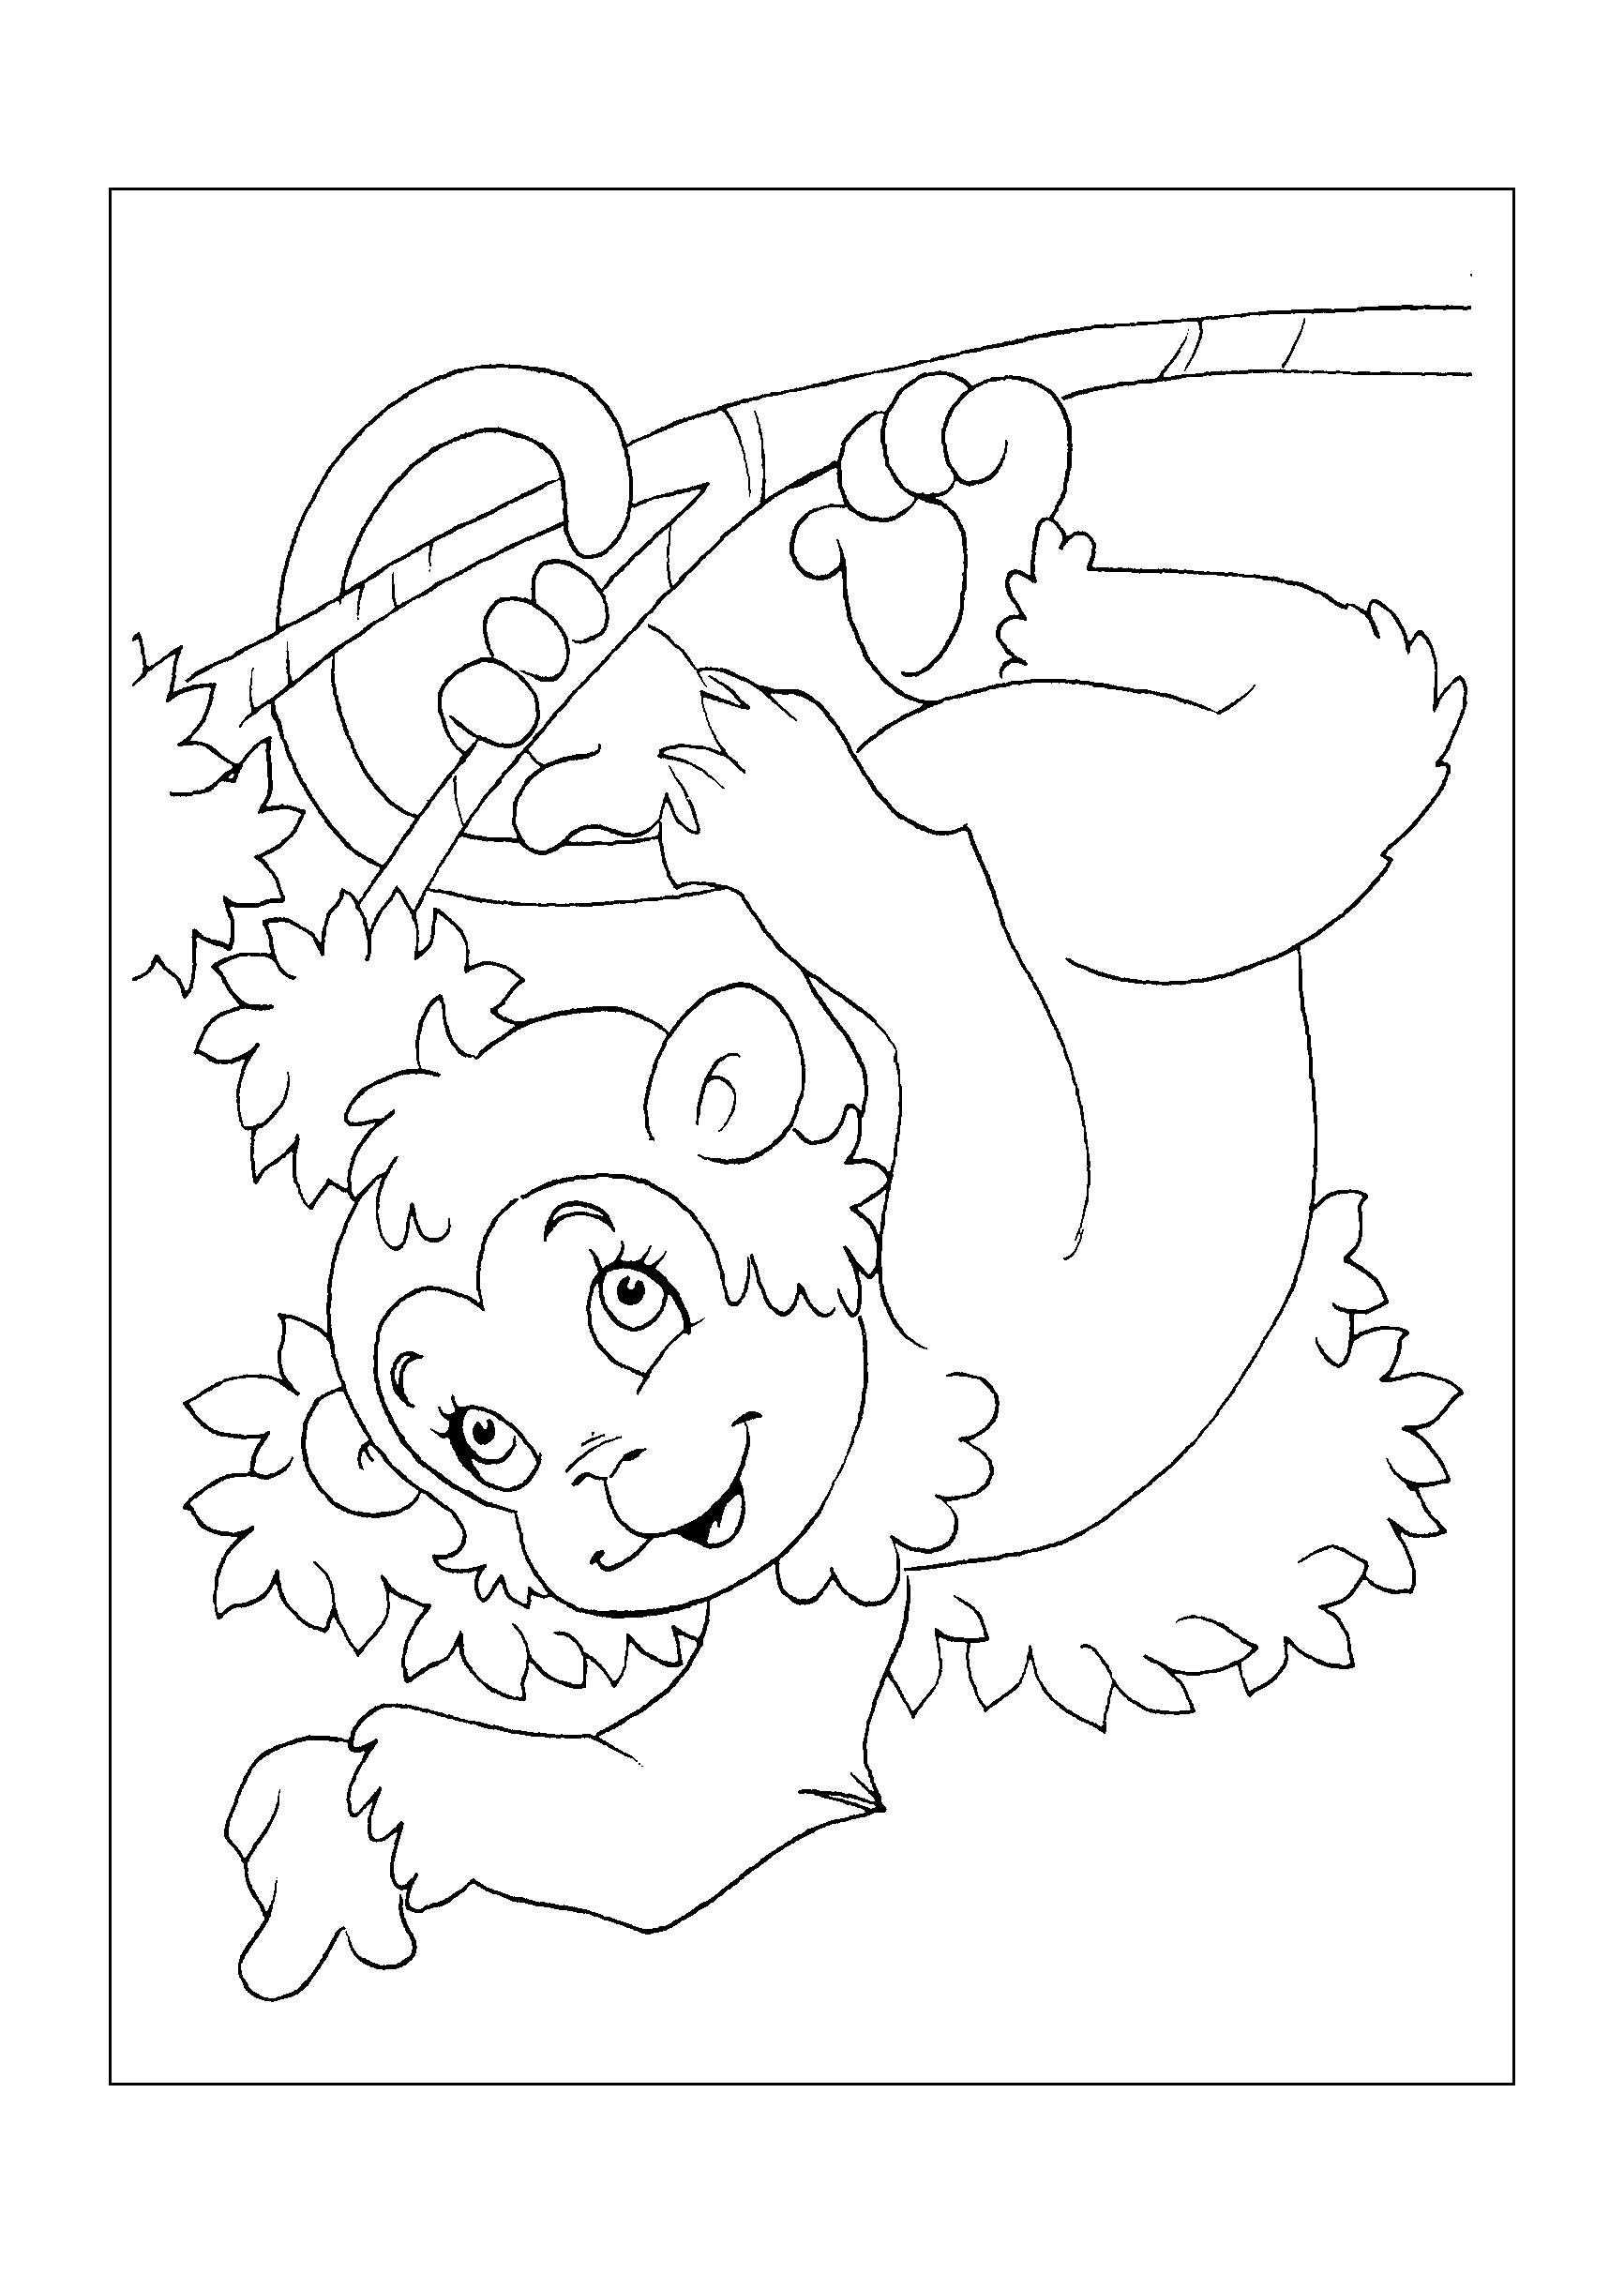 0176-desenho-colorir-macaco